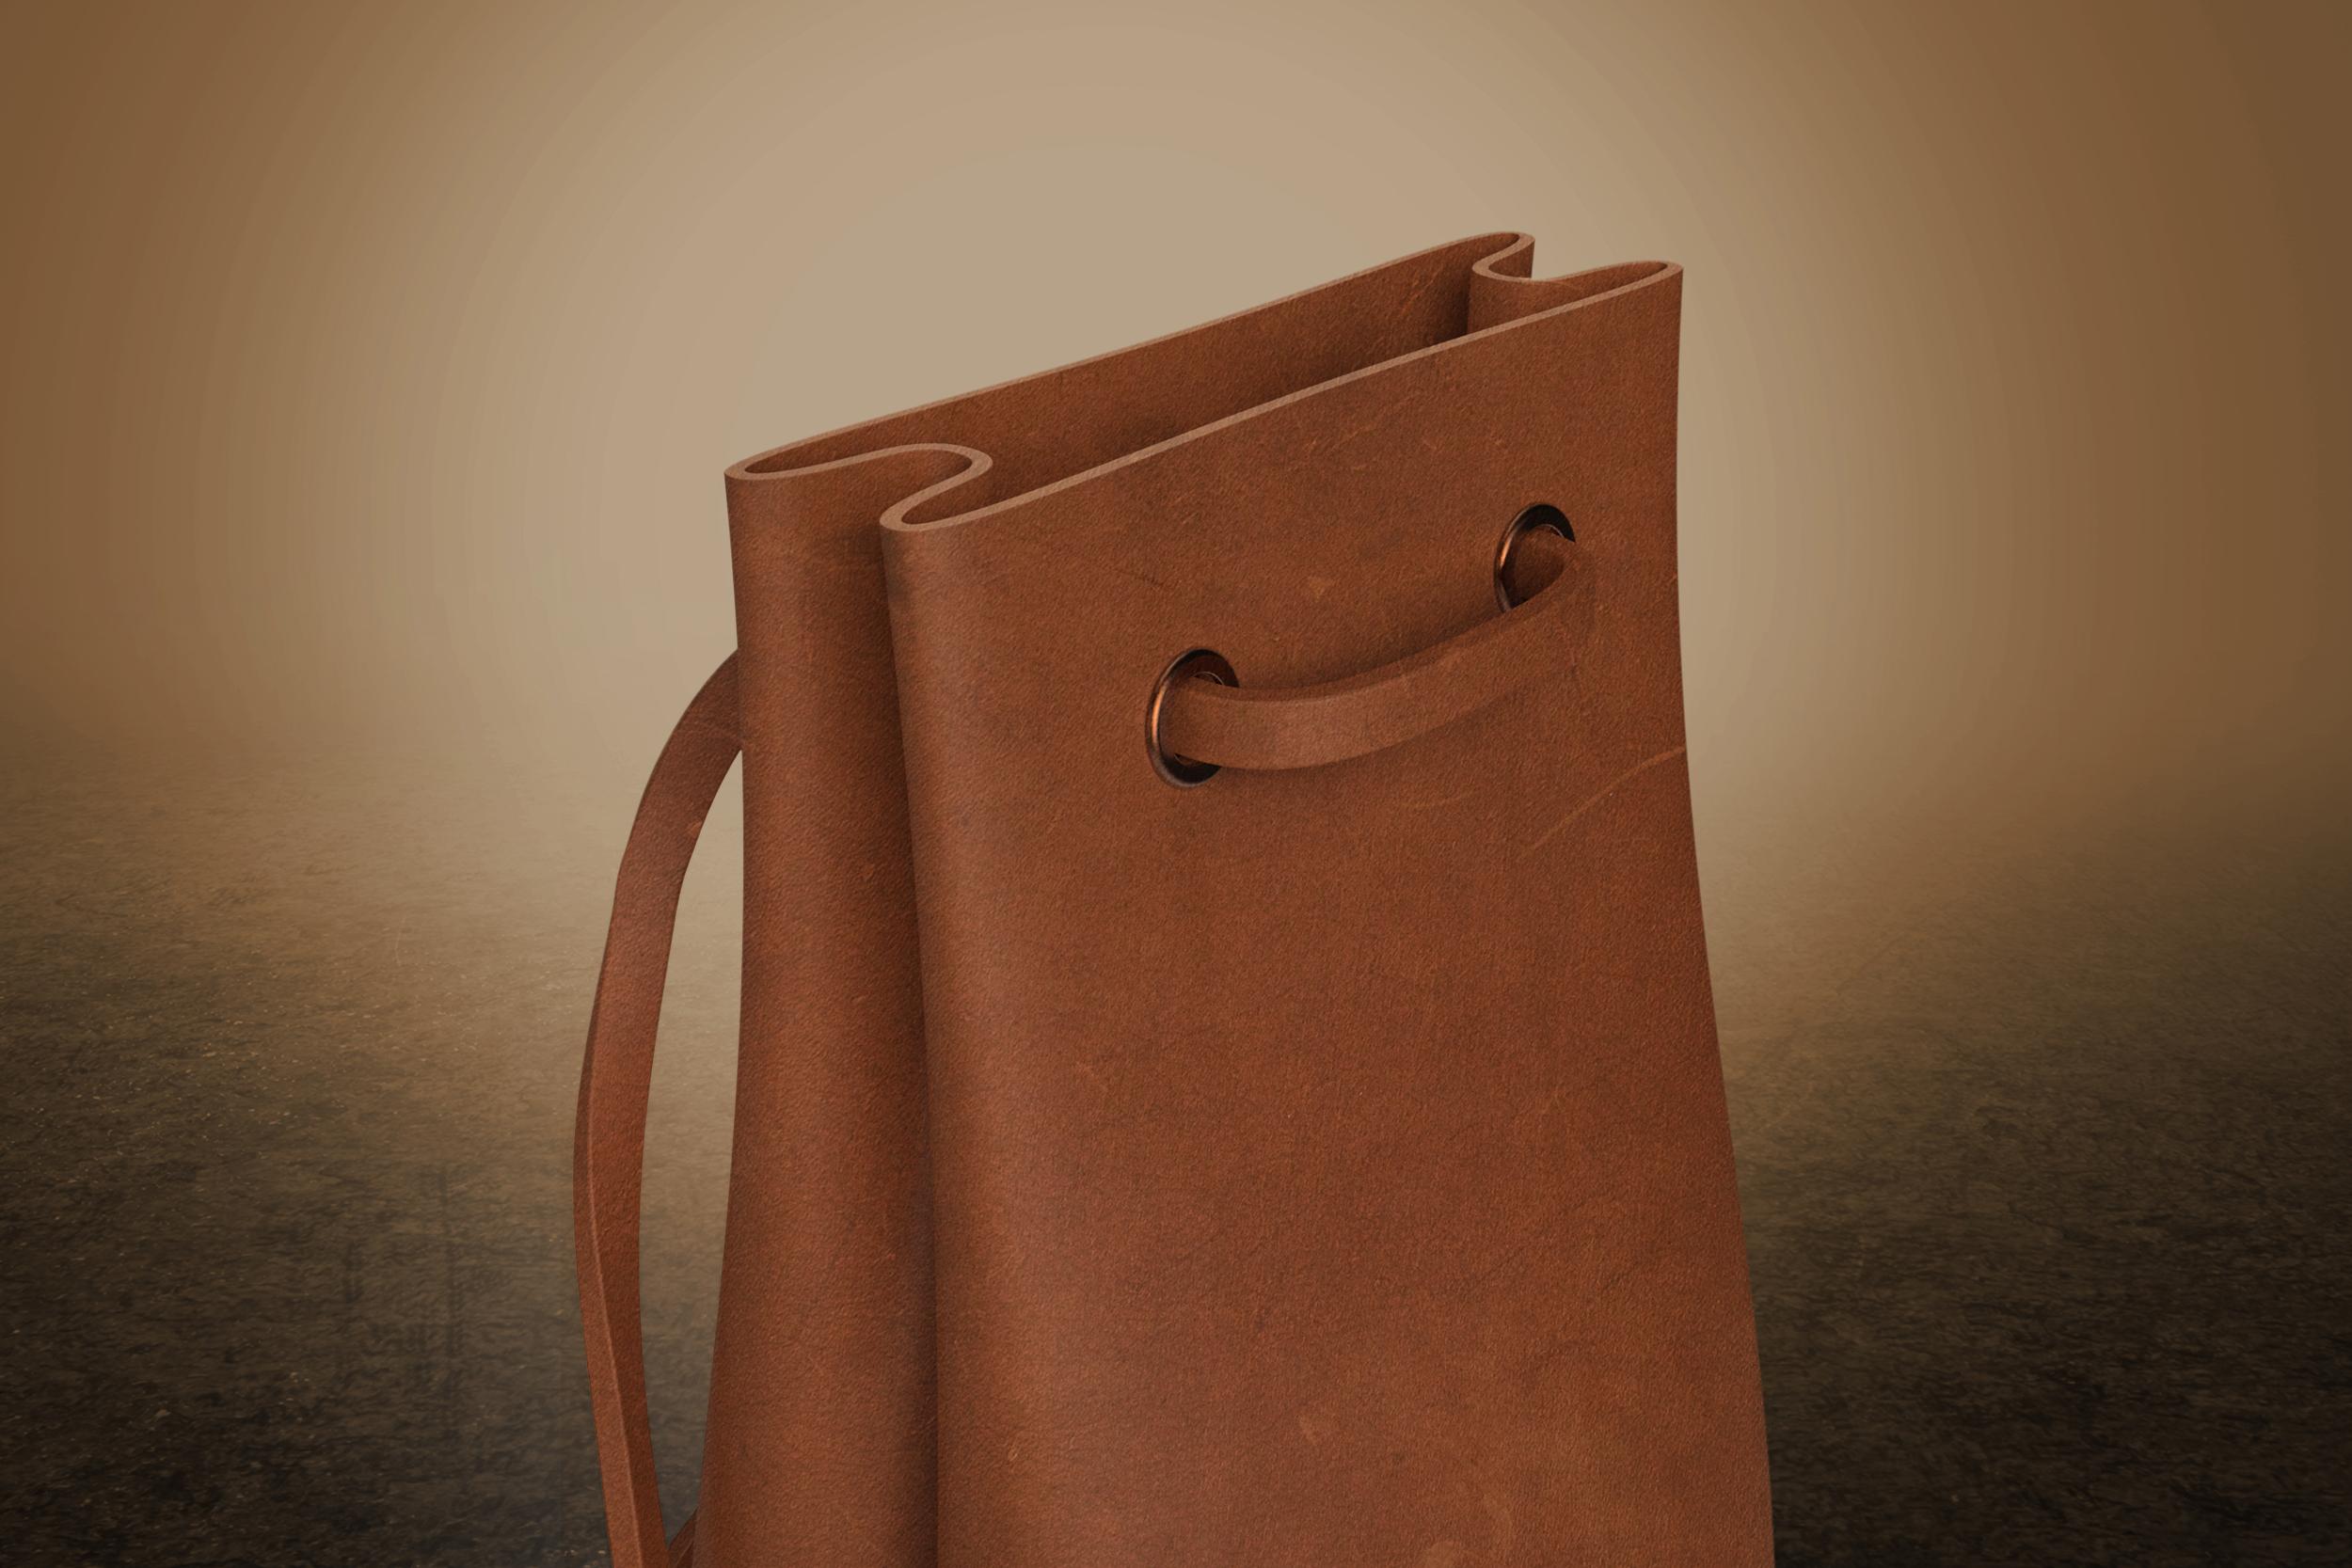 Leather Carry Bag  |  Soft Goods Design